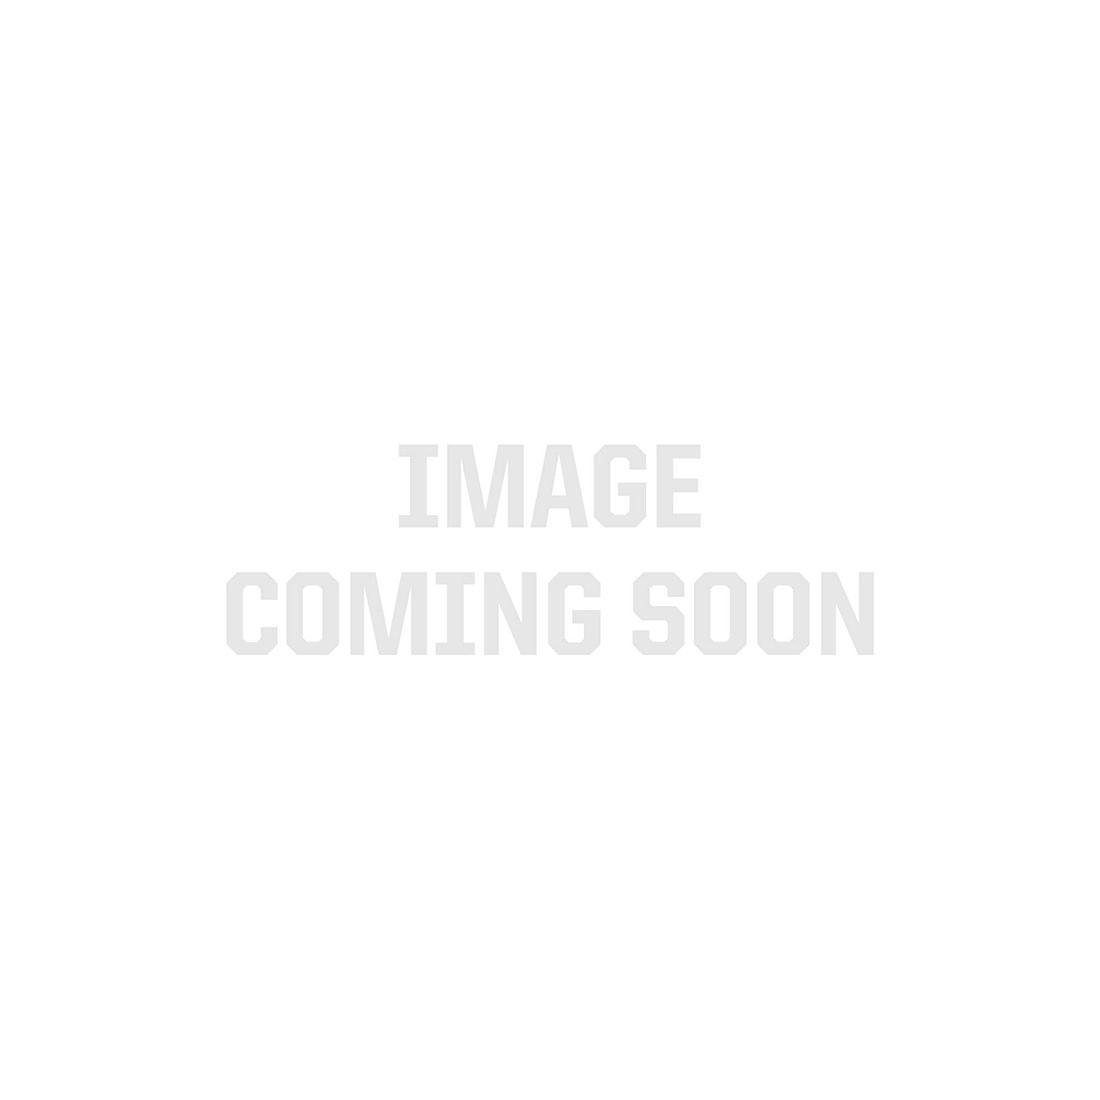 Lutron TTCL-100H Credenza Dimmable CFL/LED Lamp Dimmer; 100 Watt Black